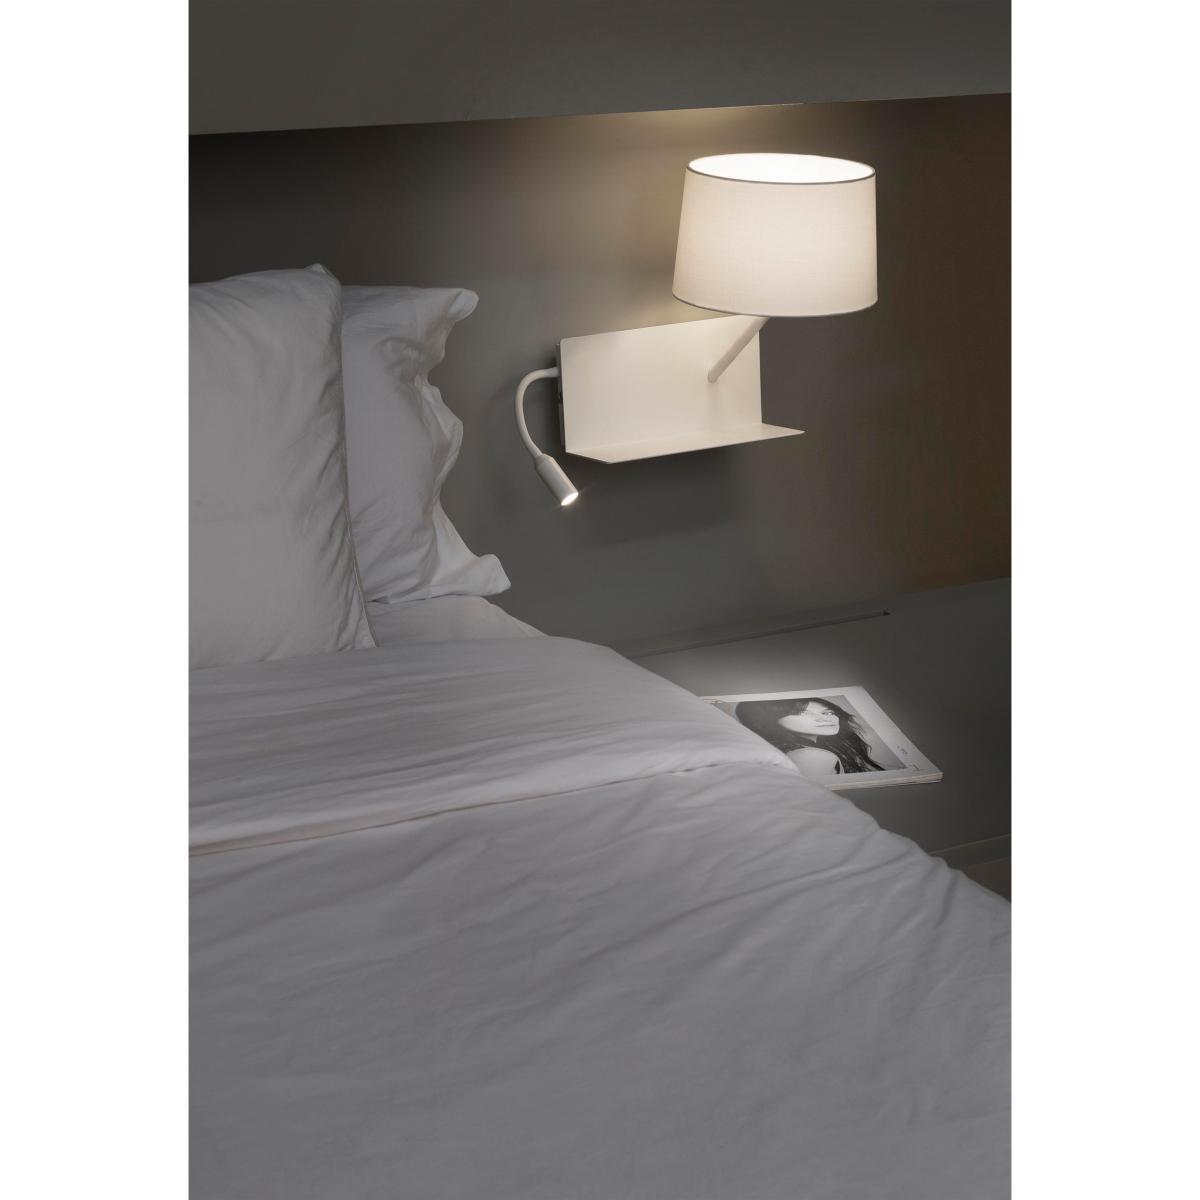 applique liseuse droite tag re led port usb faro handy 28414. Black Bedroom Furniture Sets. Home Design Ideas